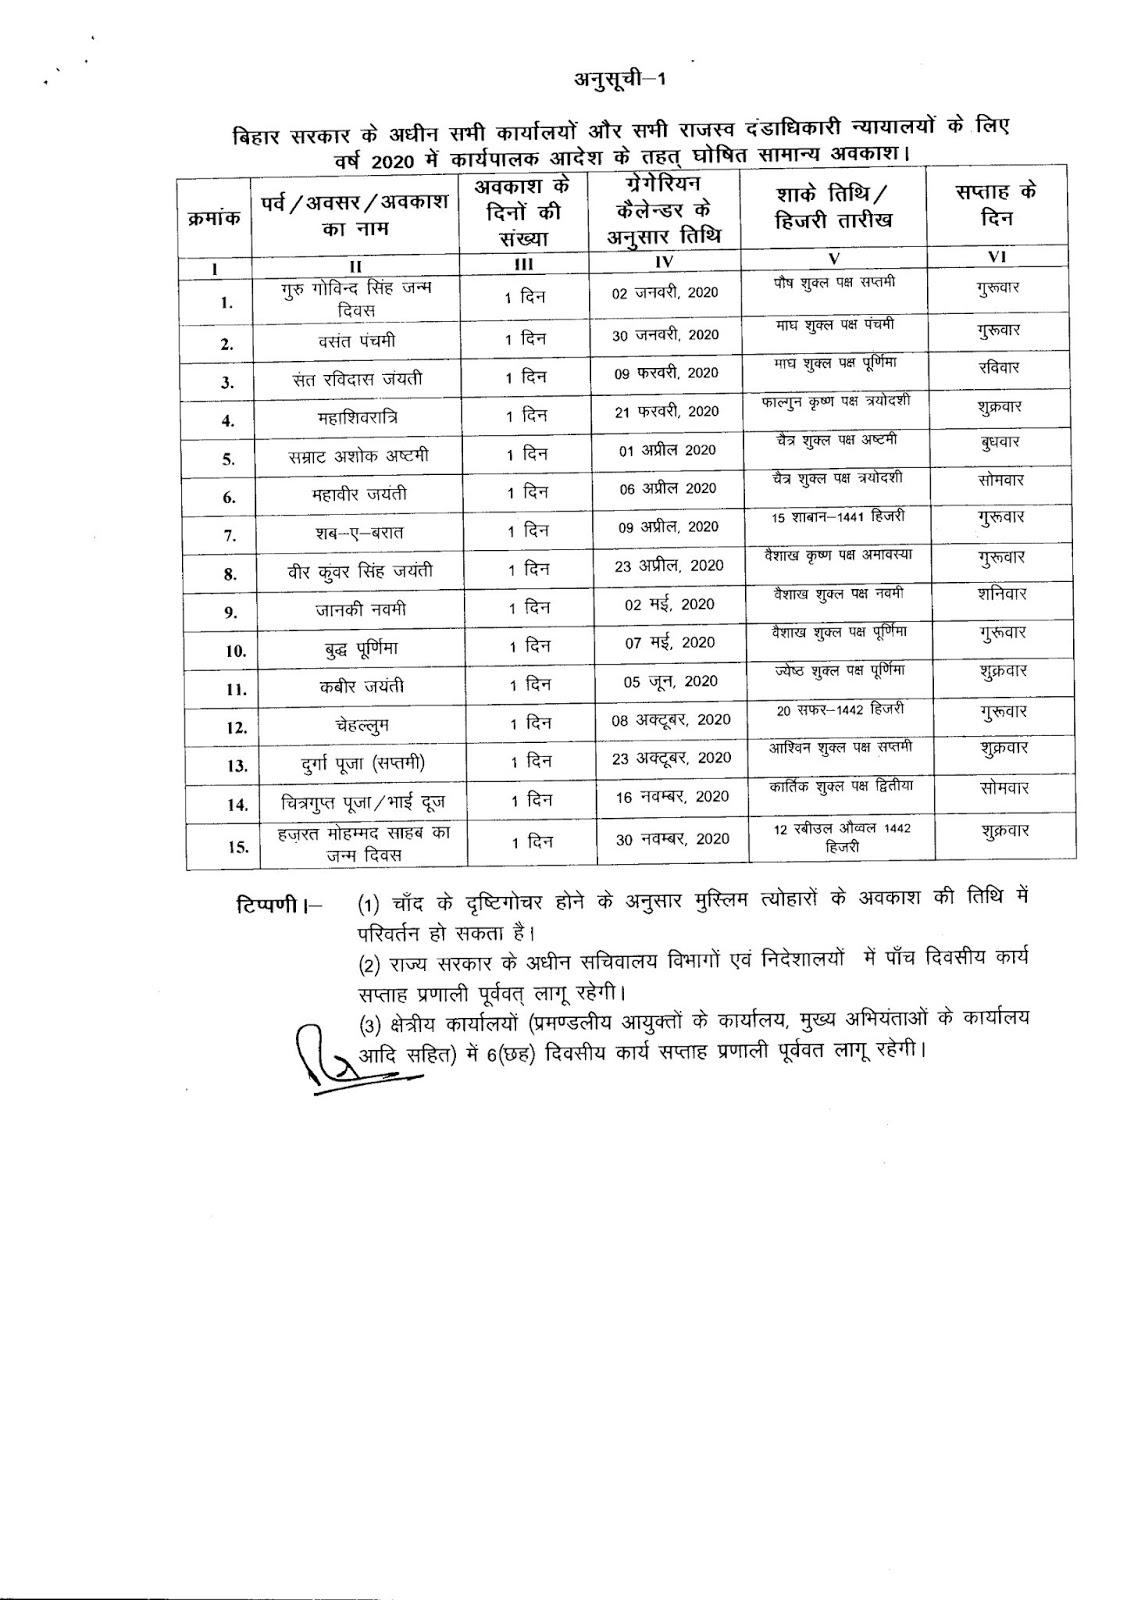 Bihar Government Calendar 2020 #educratsweb for Bihar Sarkar Calendar 2020 Pdf